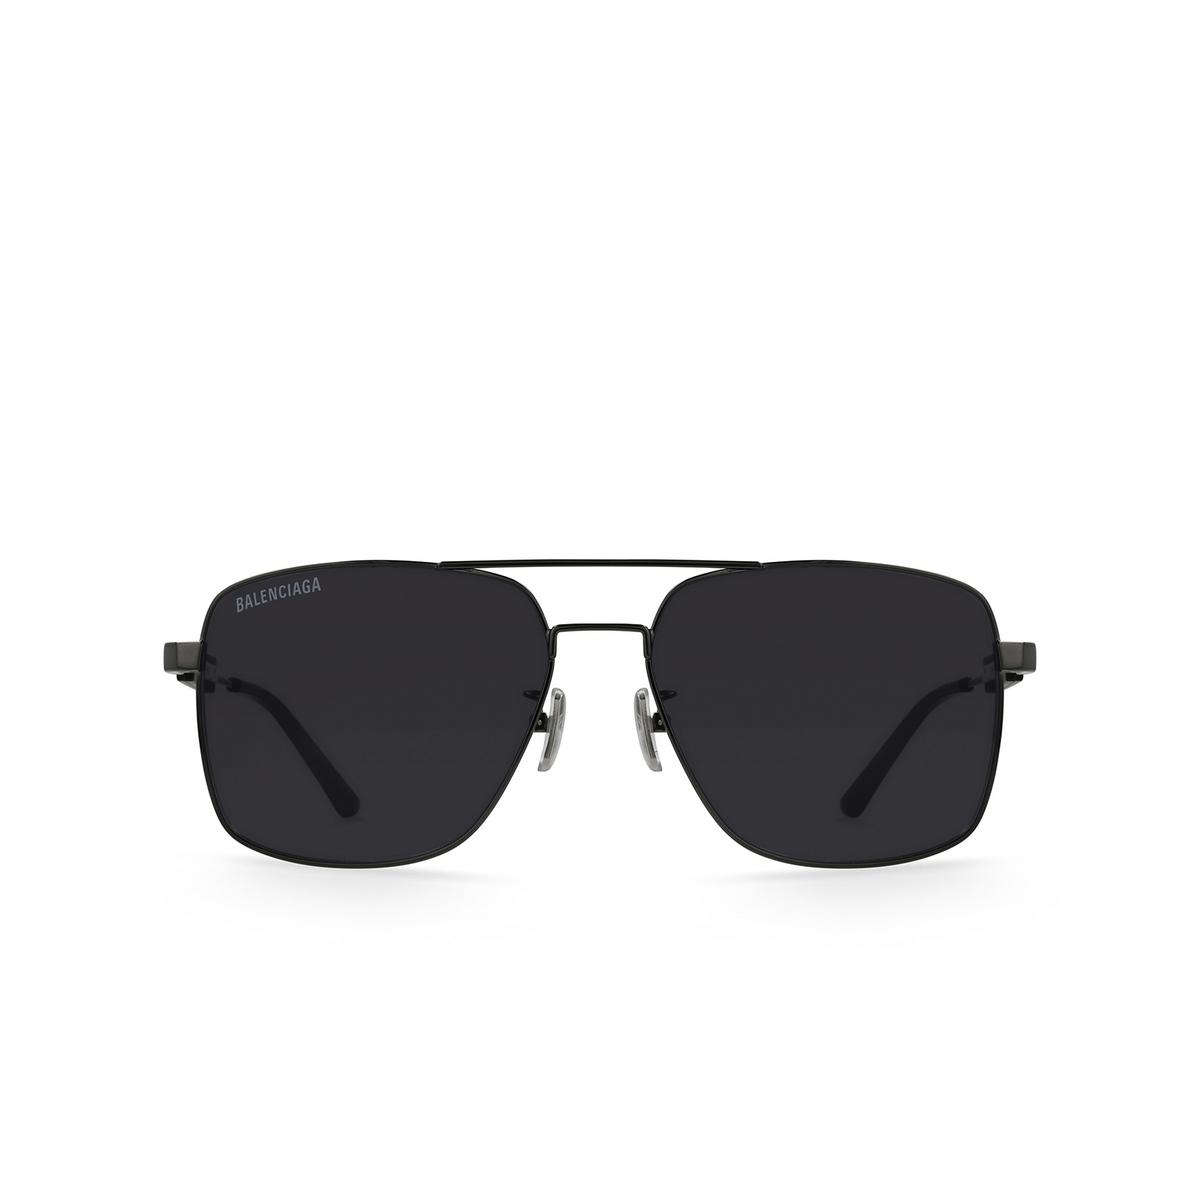 Balenciaga® Square Sunglasses: BB0116SA color Grey 001 - 1/3.